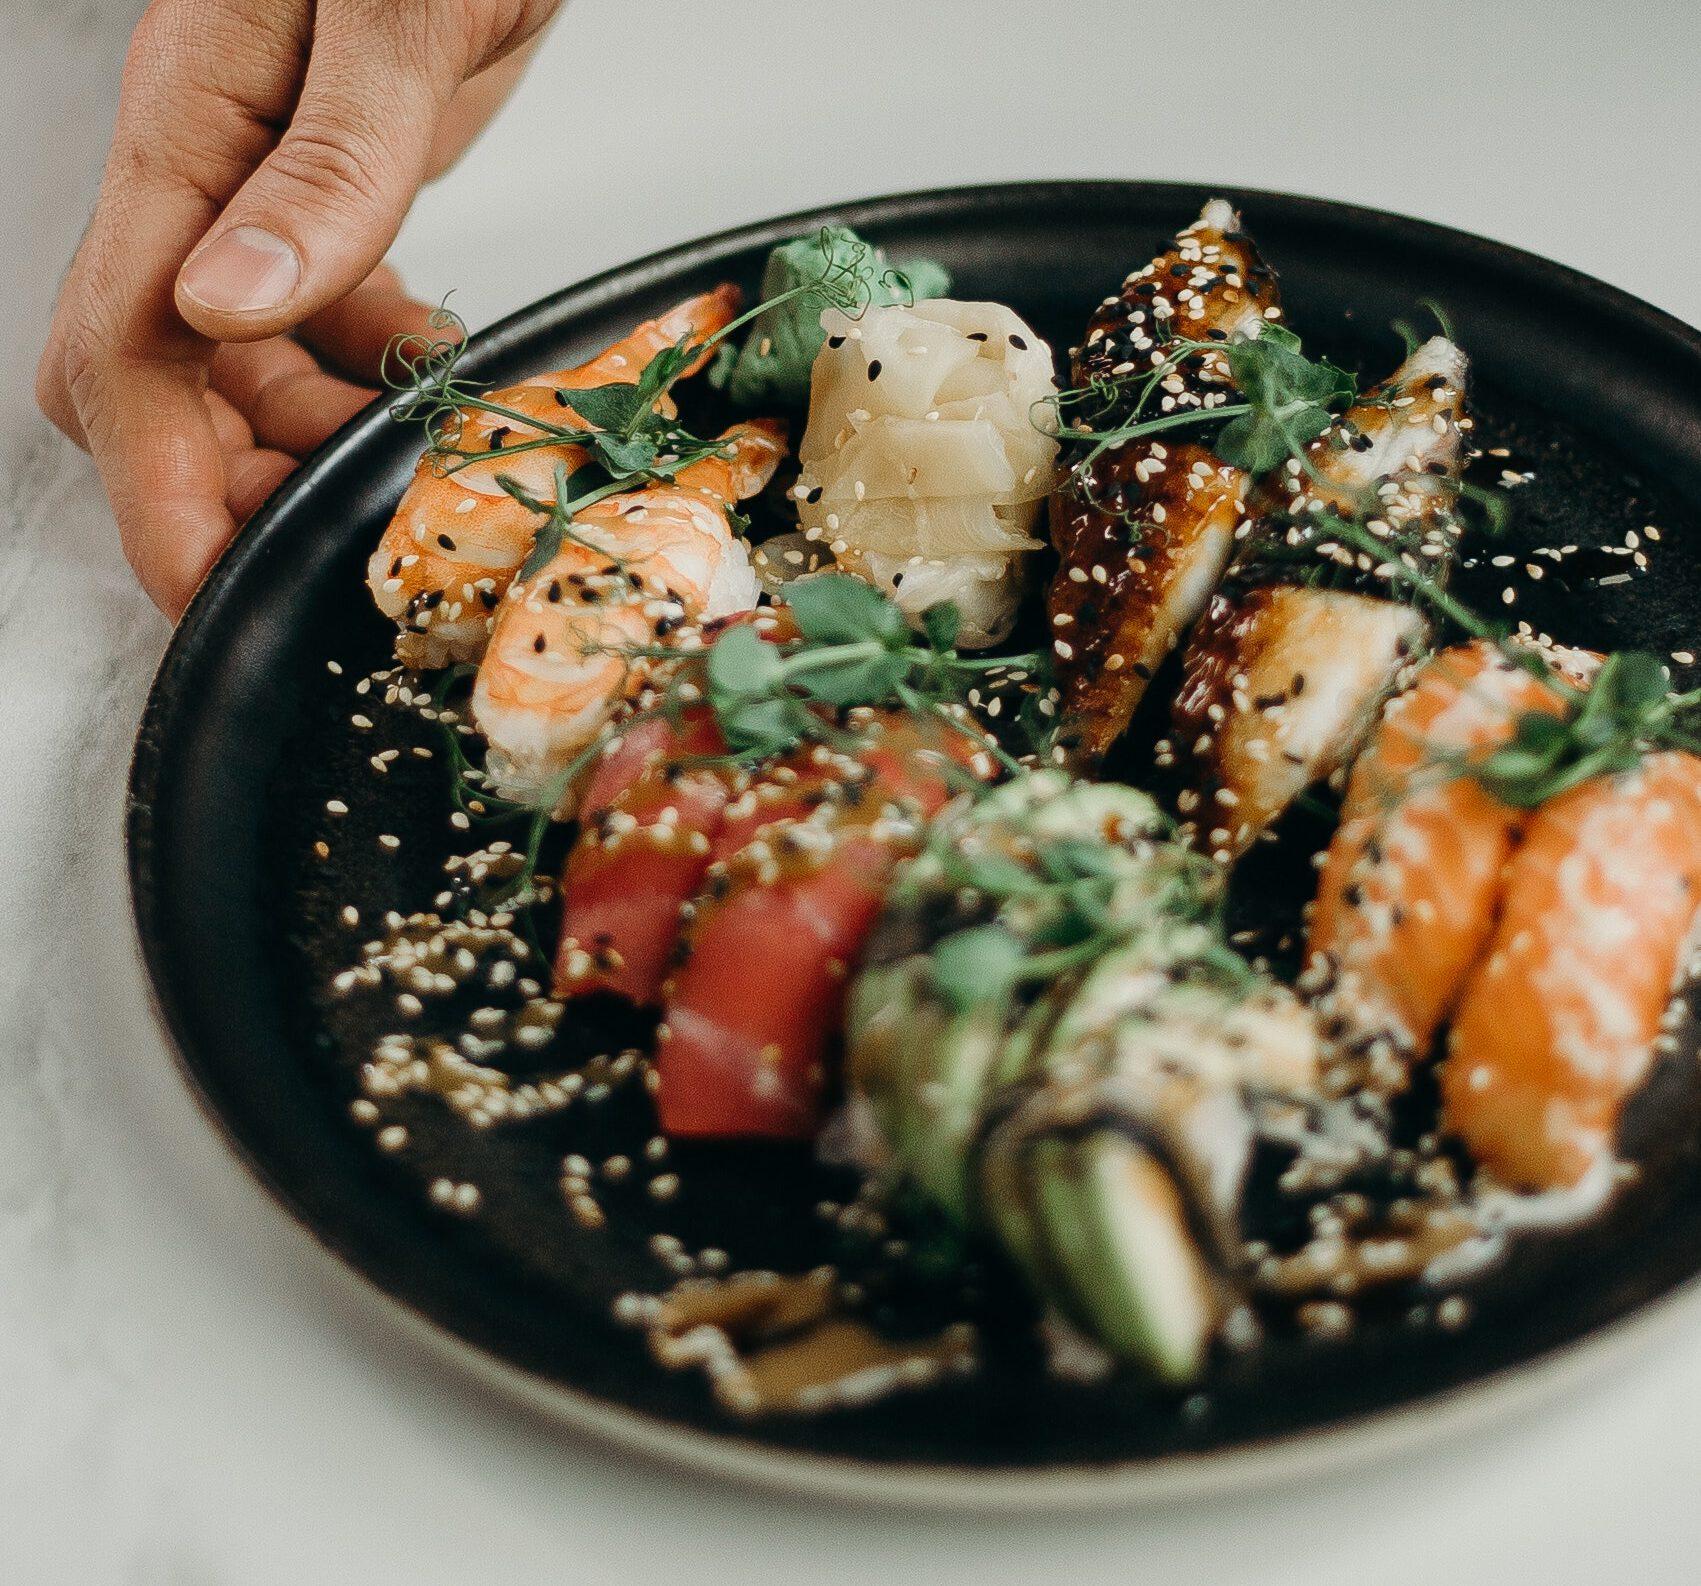 hoeveel sushi rijst per persoon? stukjes sushi per persoon - aantal sushi bestellen